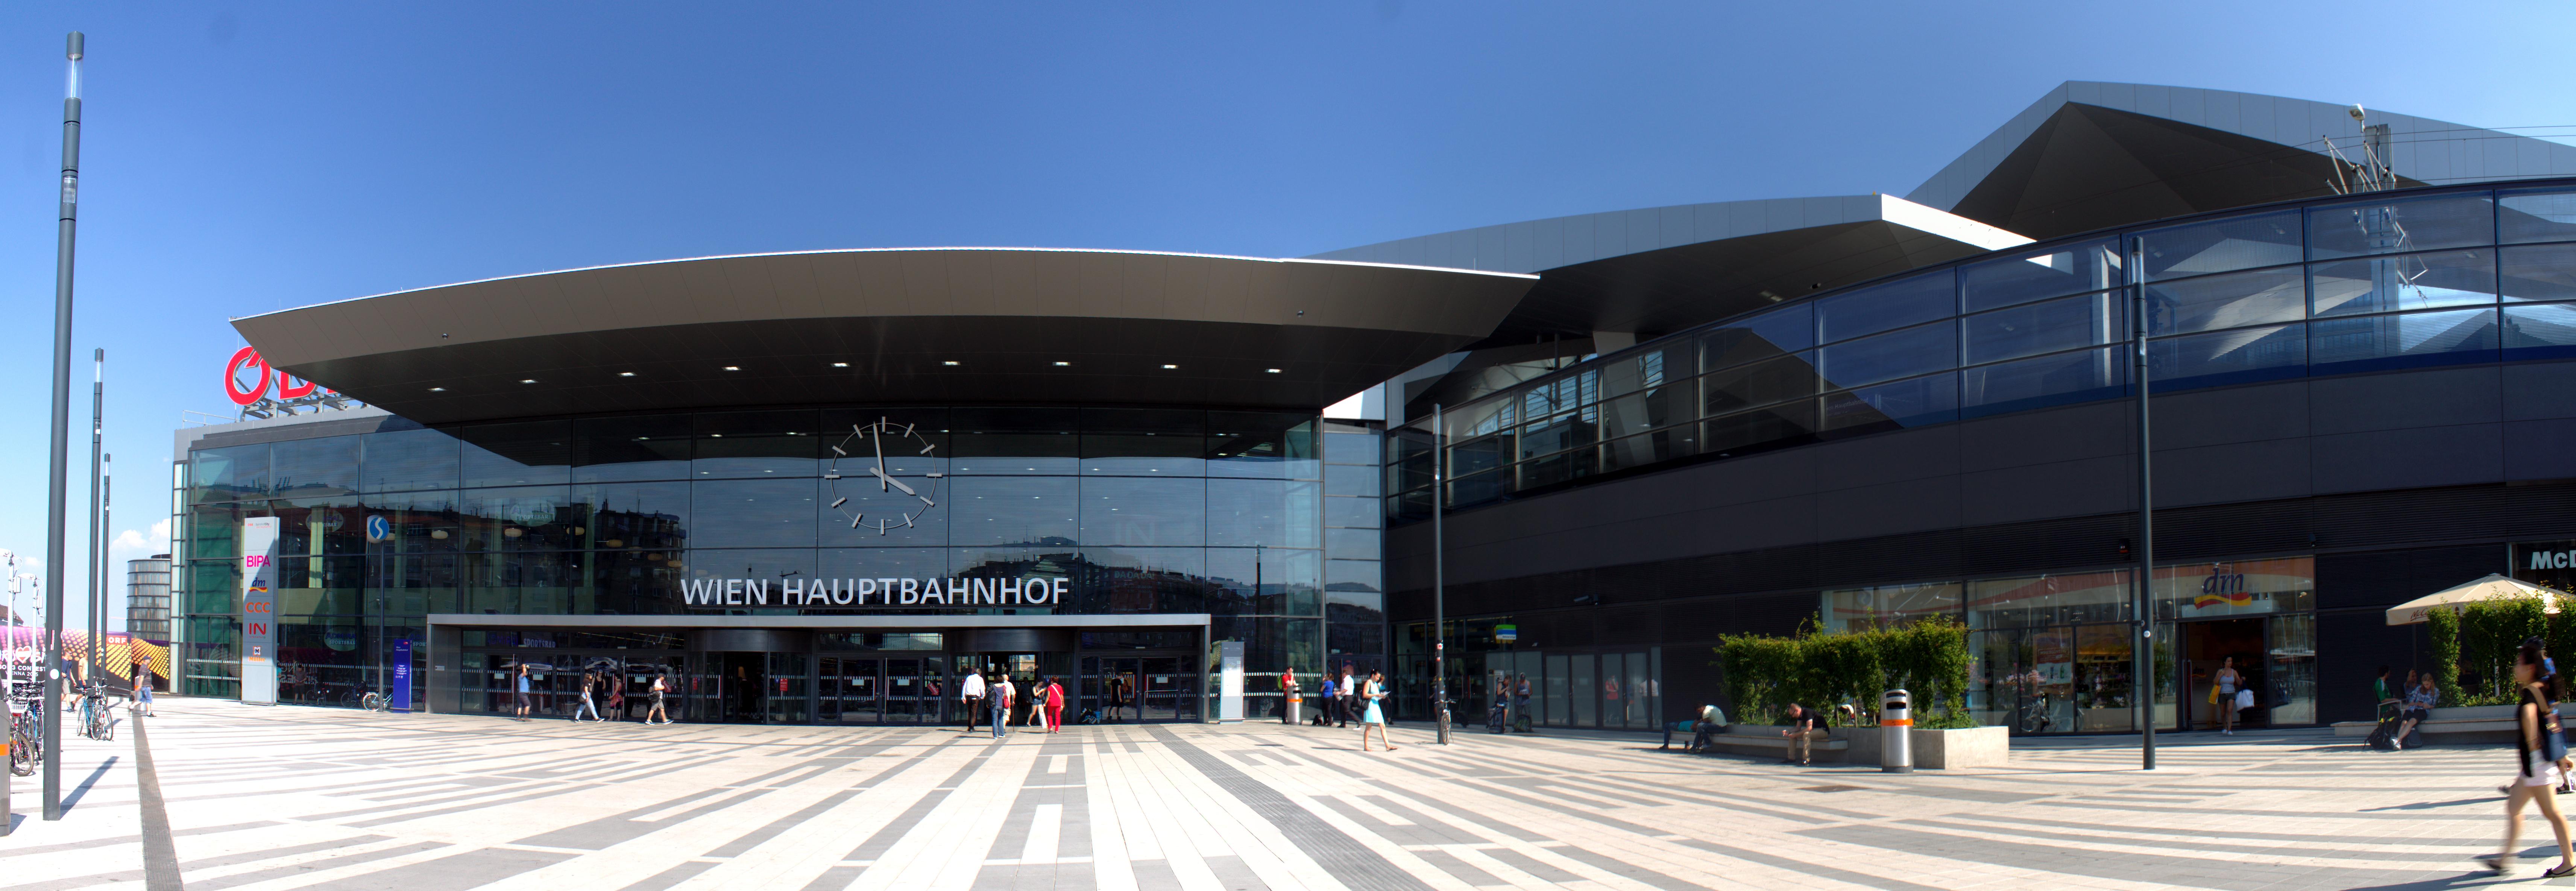 Datei:Wien Hauptbahnhof Eingang Wiedner Gürtel.jpg – Wikipedia